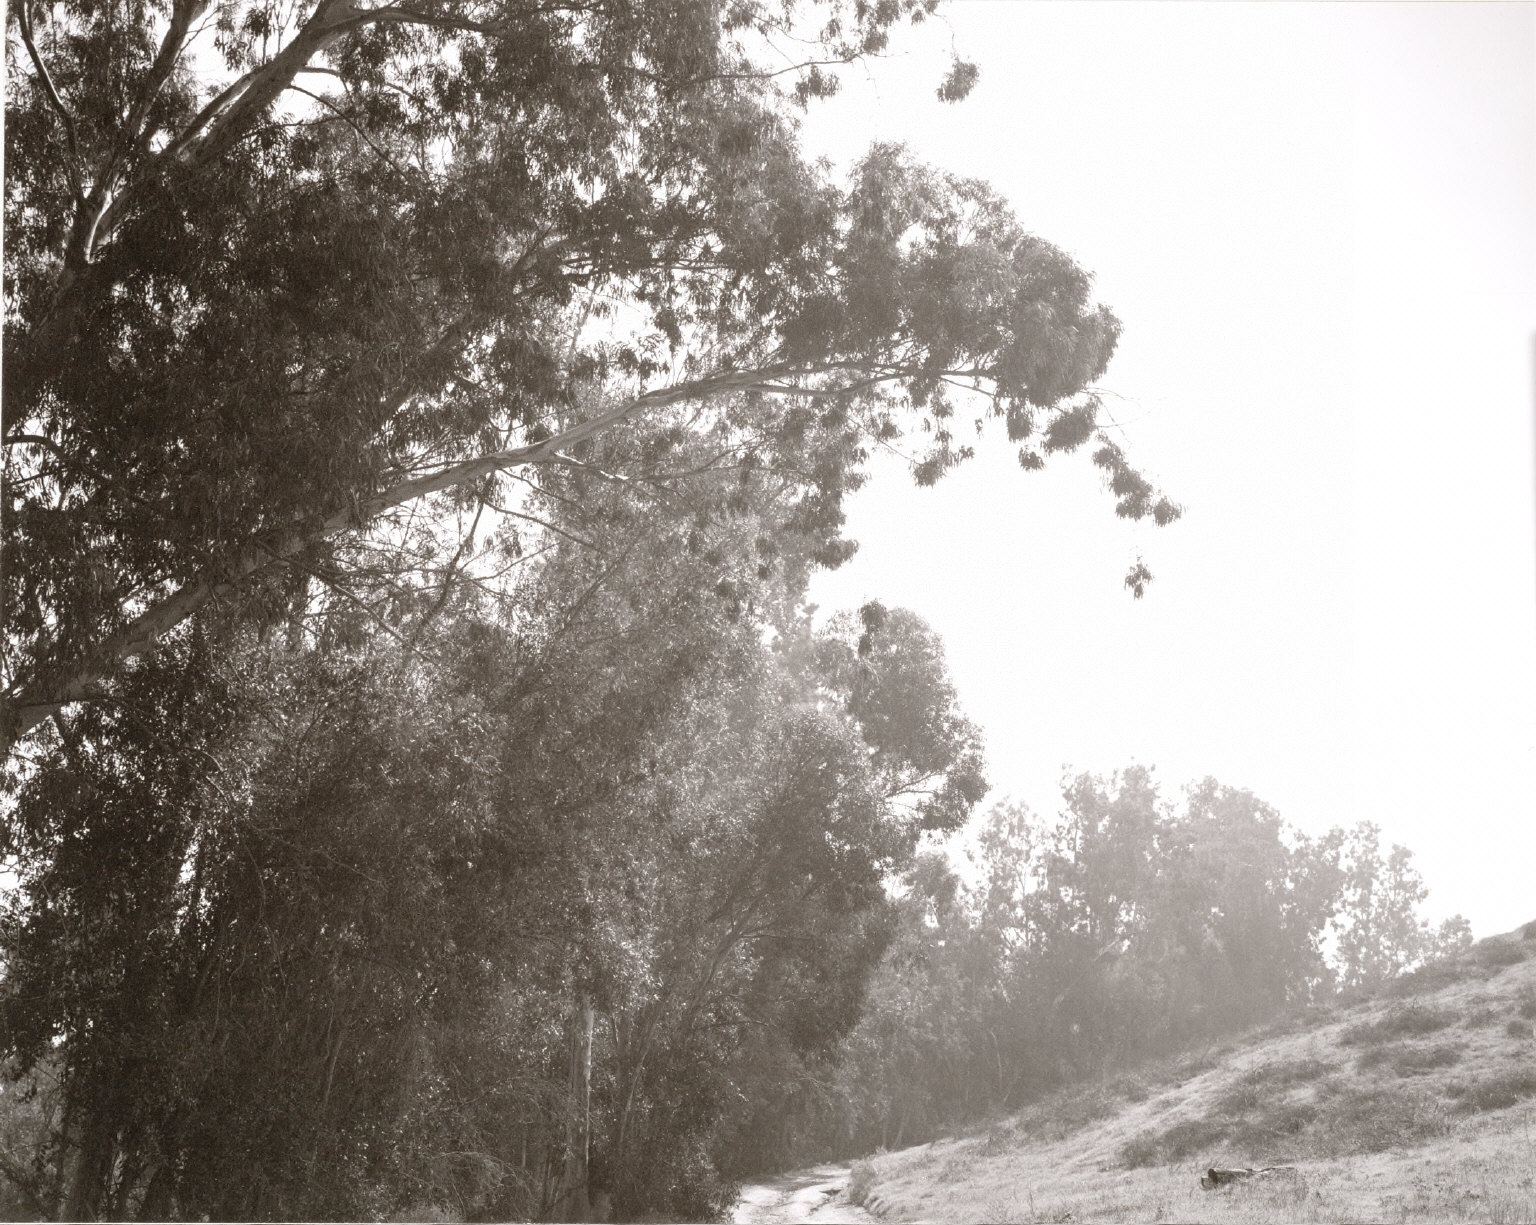 Eucalyptus Along Interstate 10, San Bernardino County, California